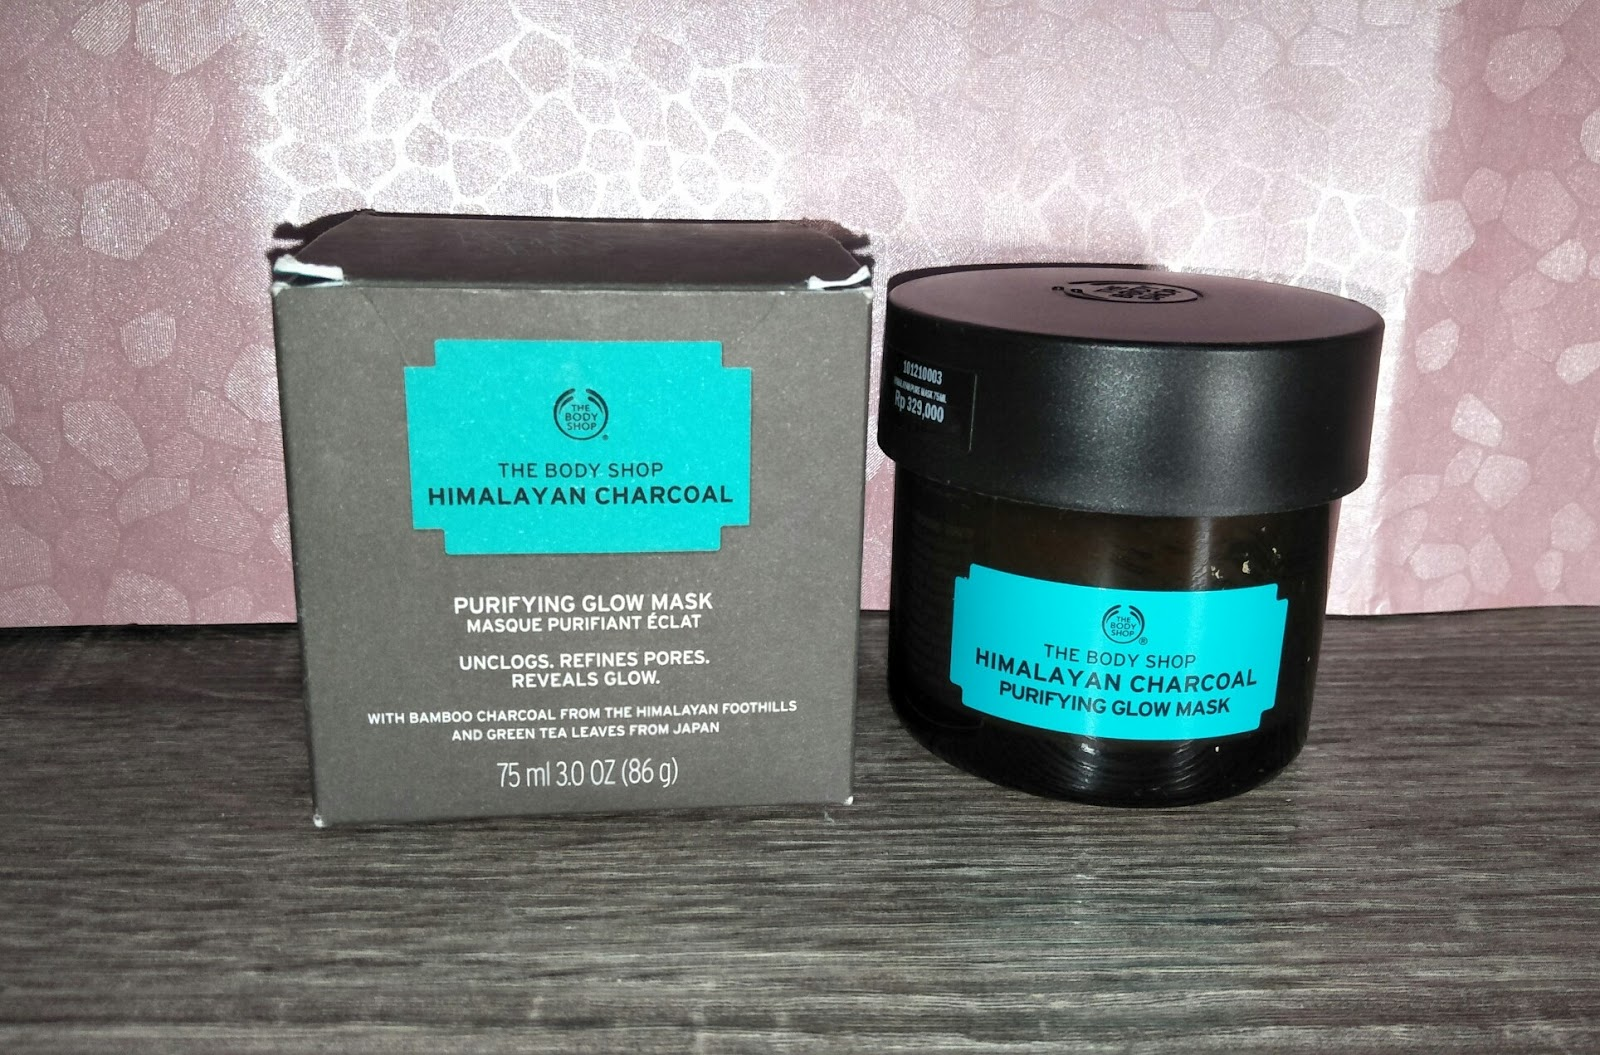 Review The Body Shop Himalayan Charcoal Purifying Glow Mask Dupe Glamglow Supermud Mask Masker Untuk Kulit Berminyak Pori Pori Besar Carolline S Beauty Blog